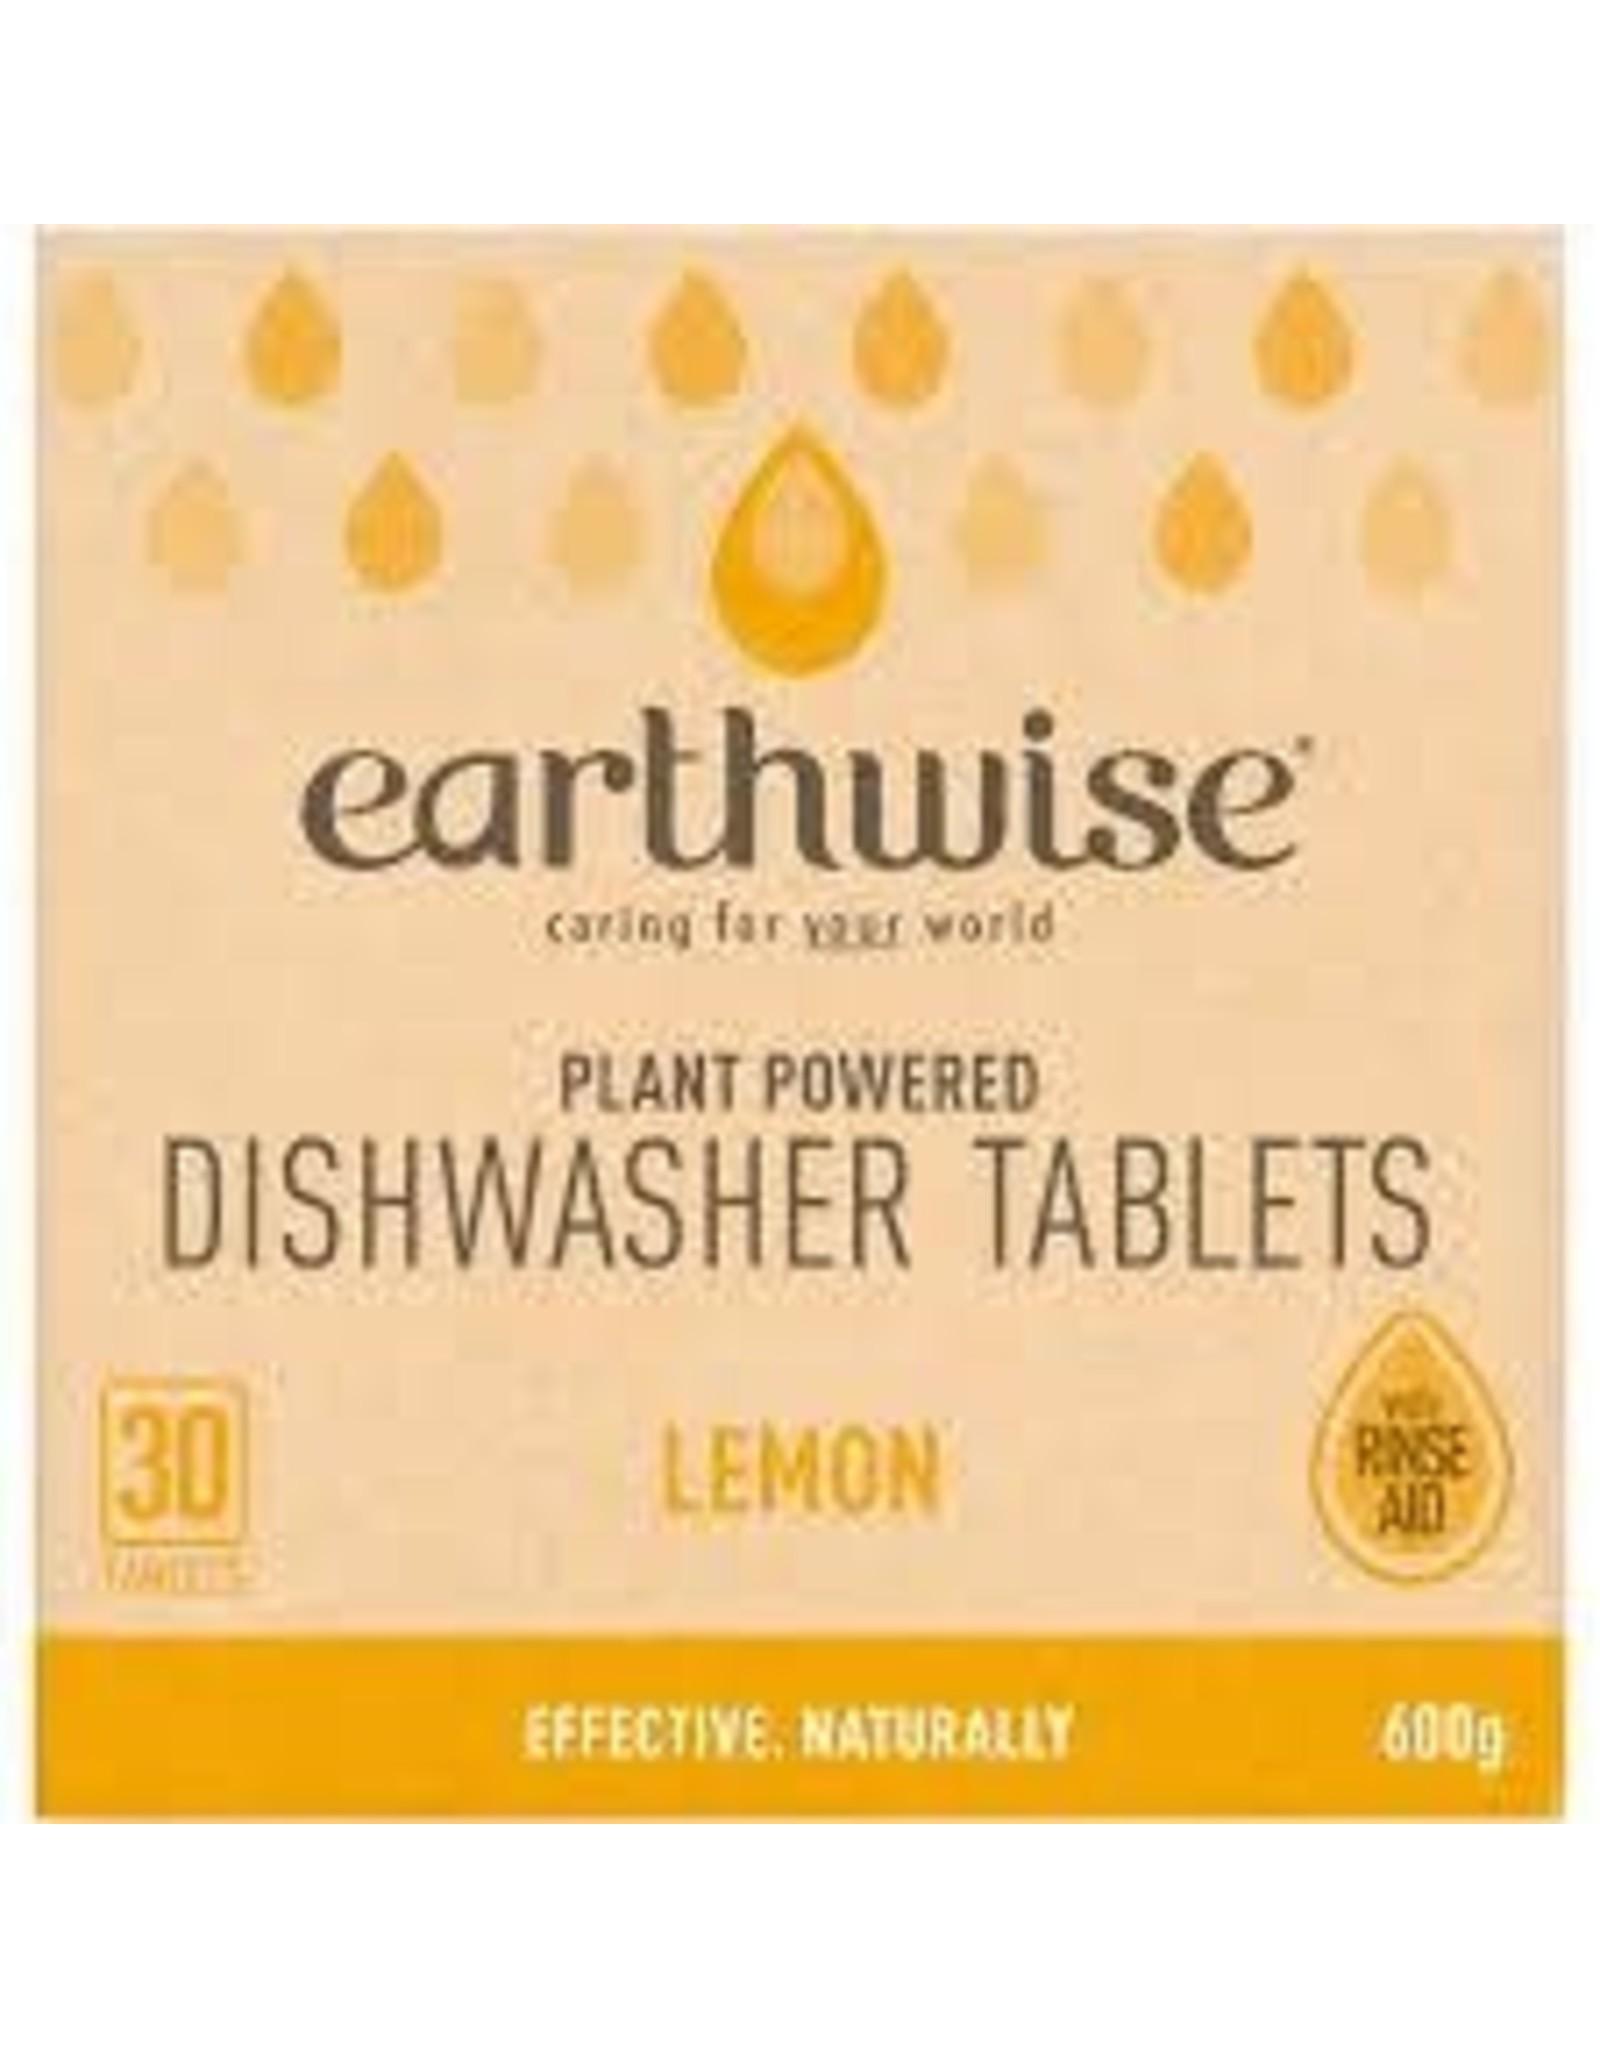 Earthwise Dishwasher Tablets Lemon